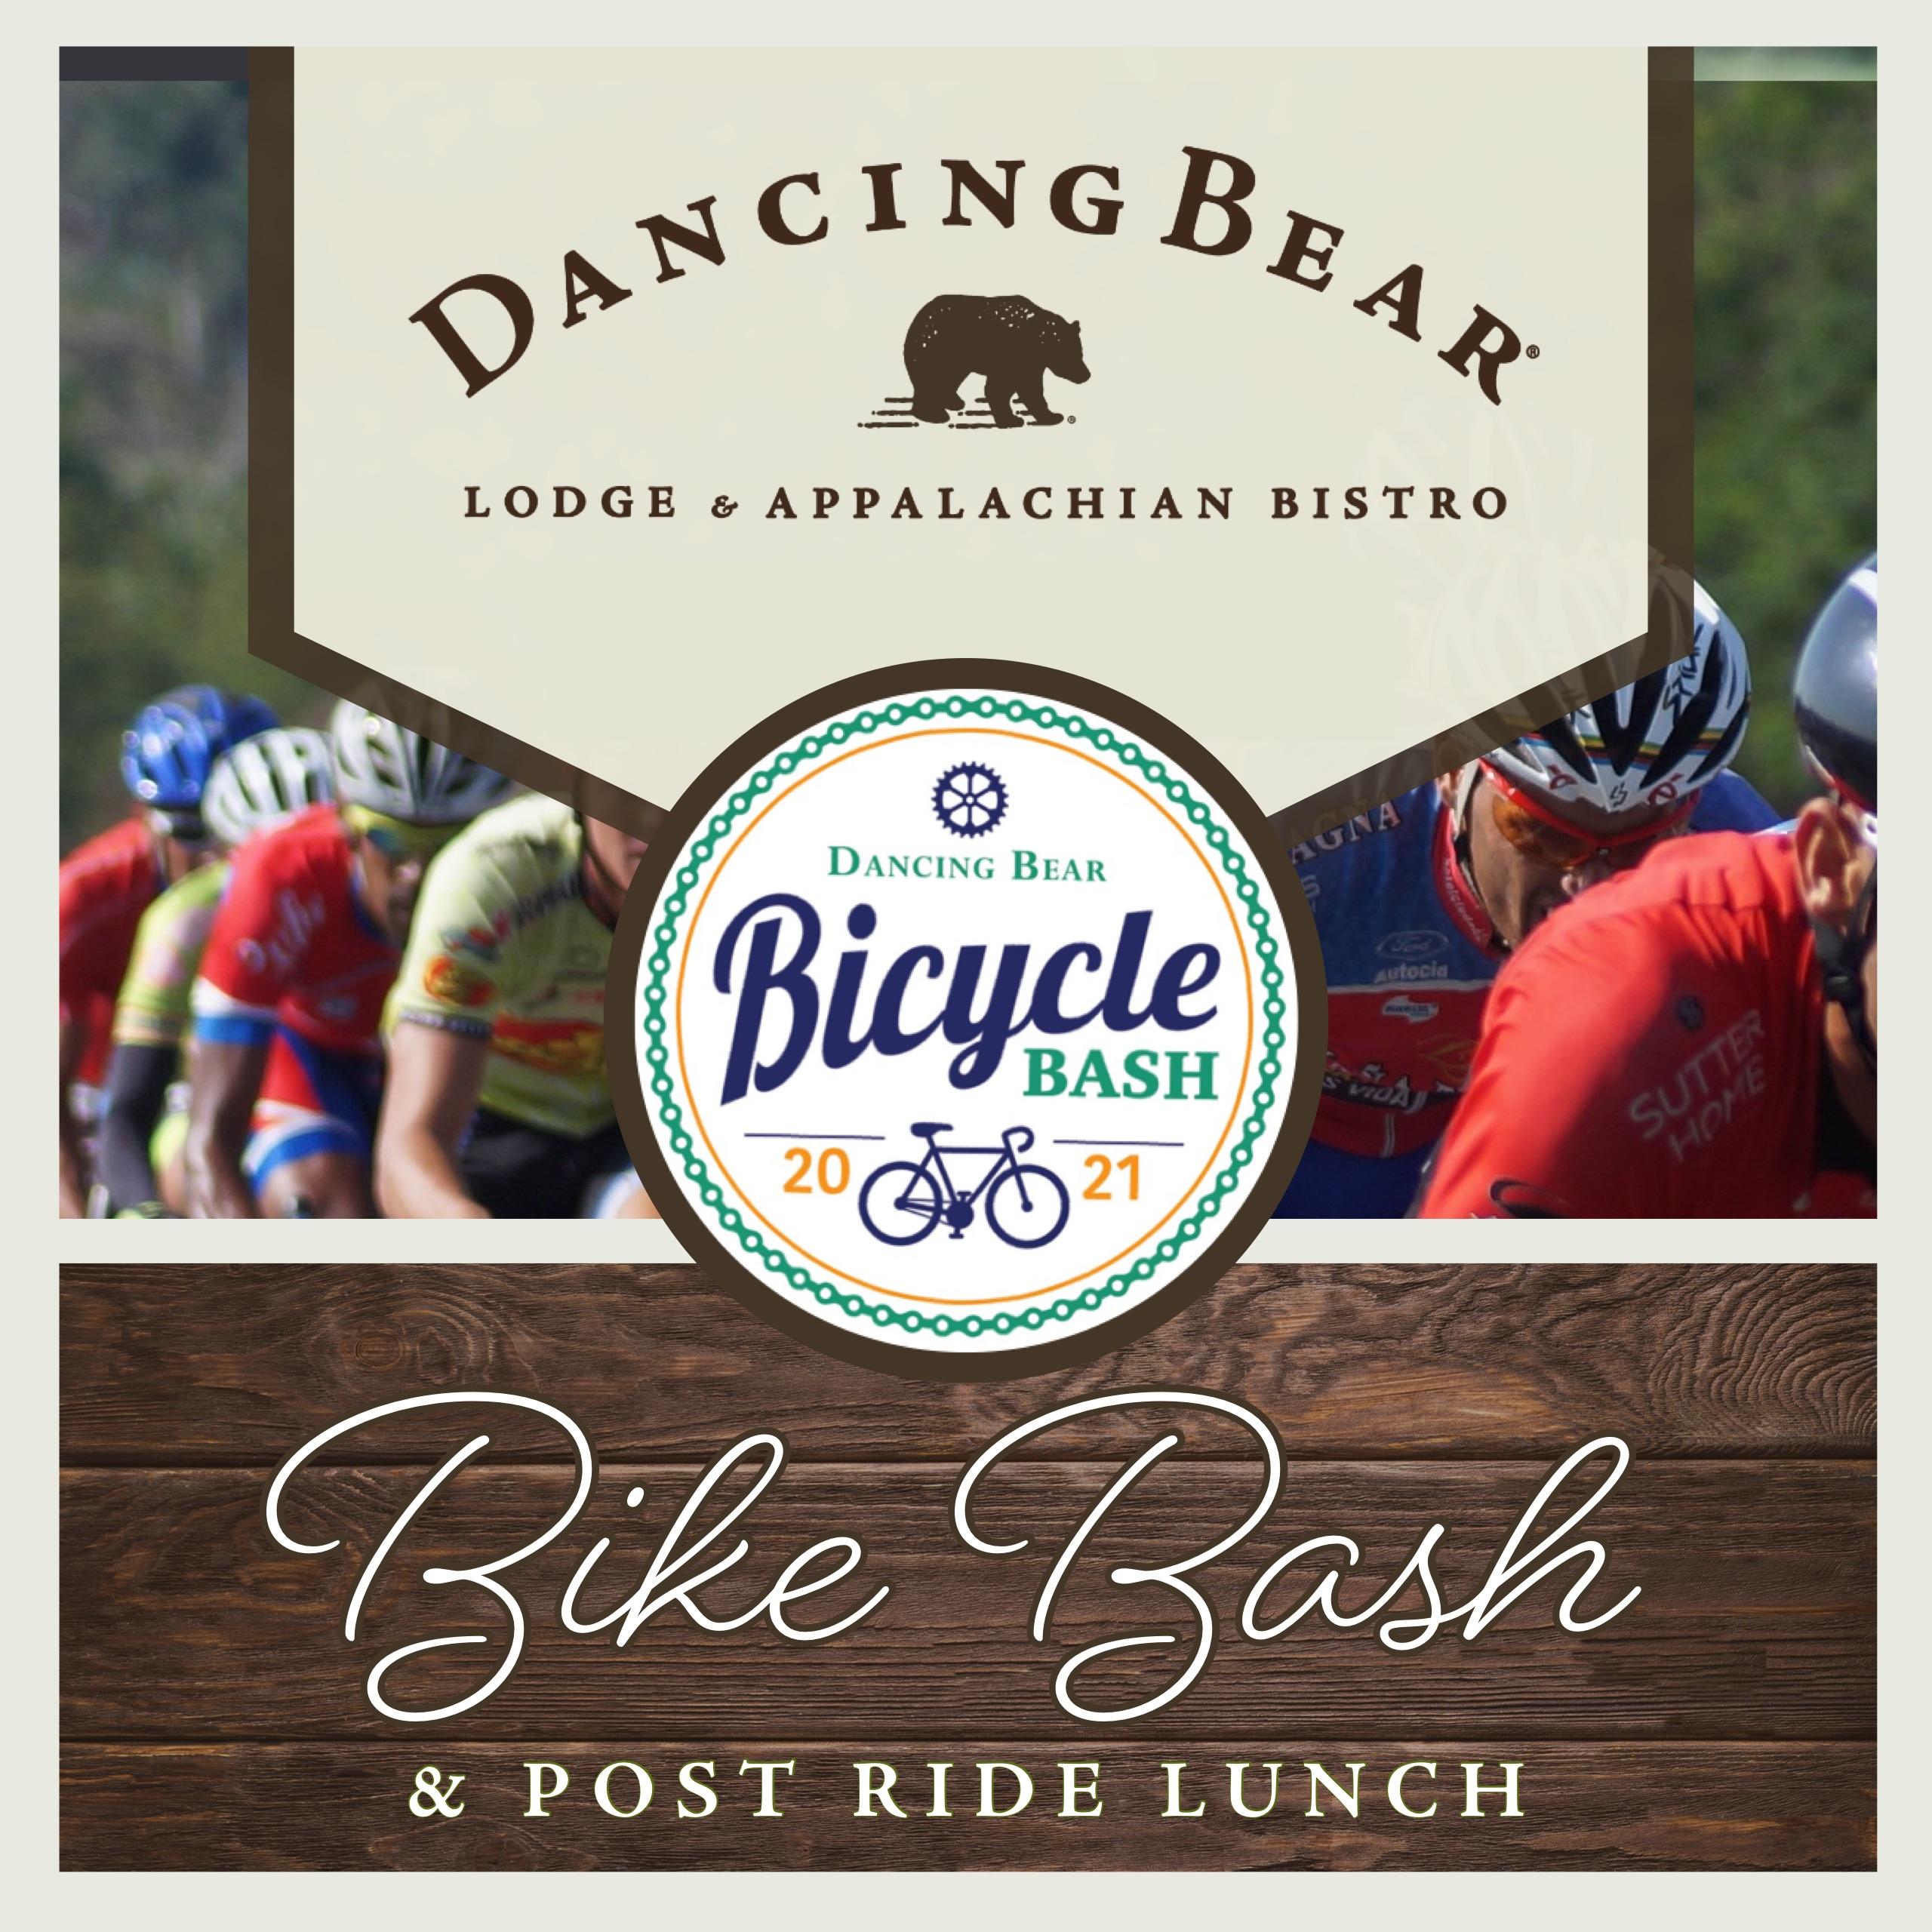 Dancing Bear Bicycle Bash 2021